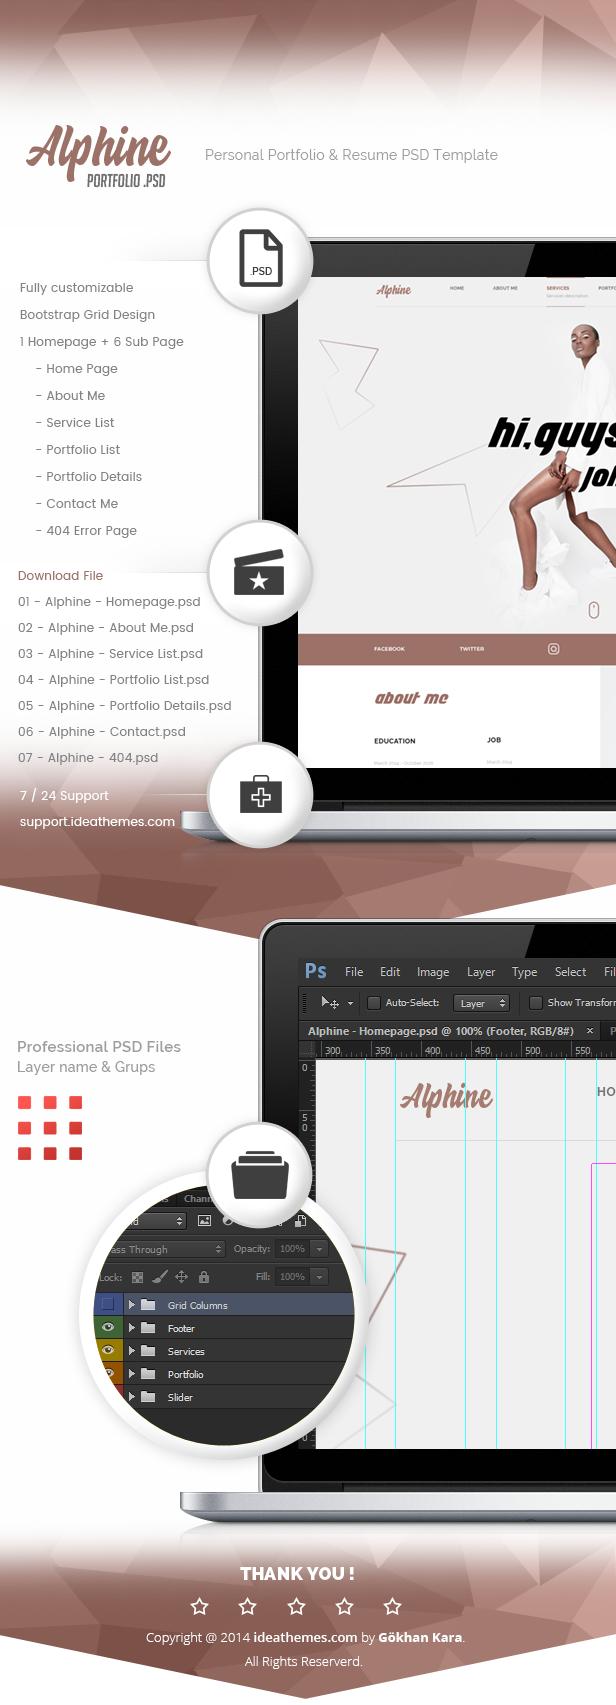 Alphine - Personal Portfolio & Resume PSD Template